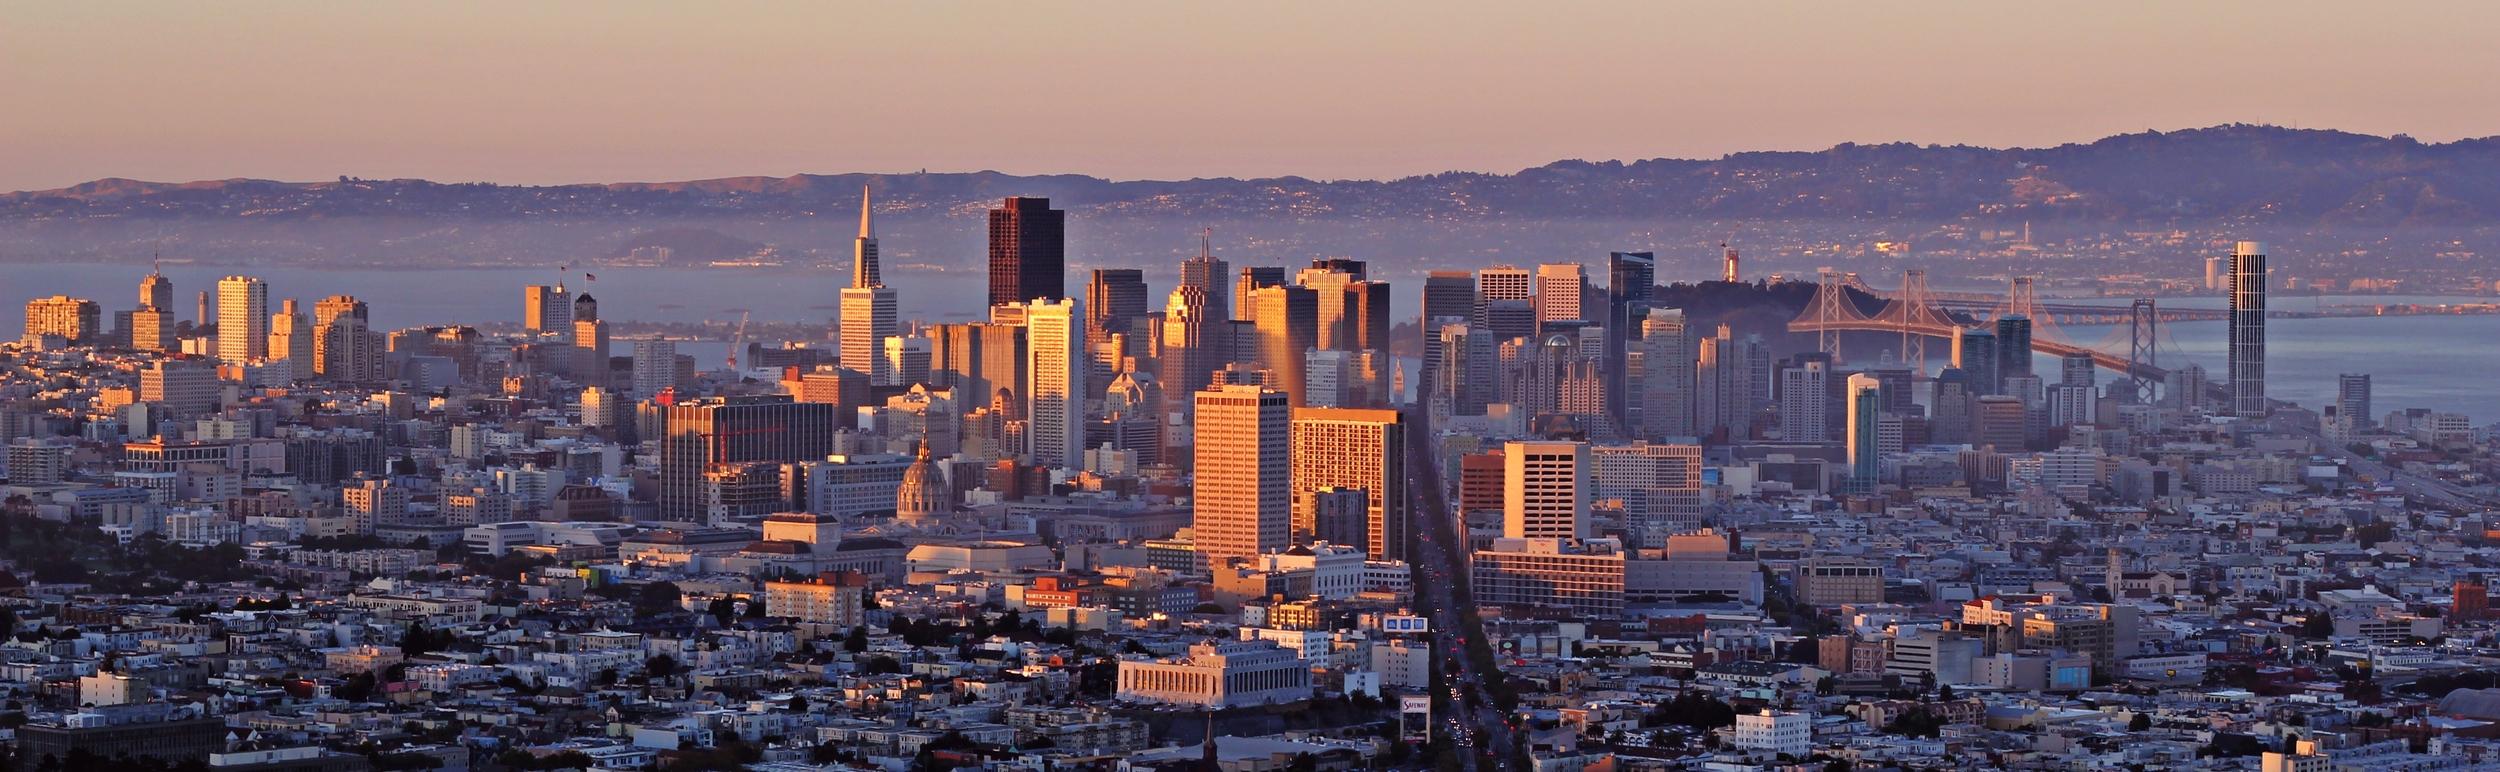 San_Francisco_(Sunset).jpg